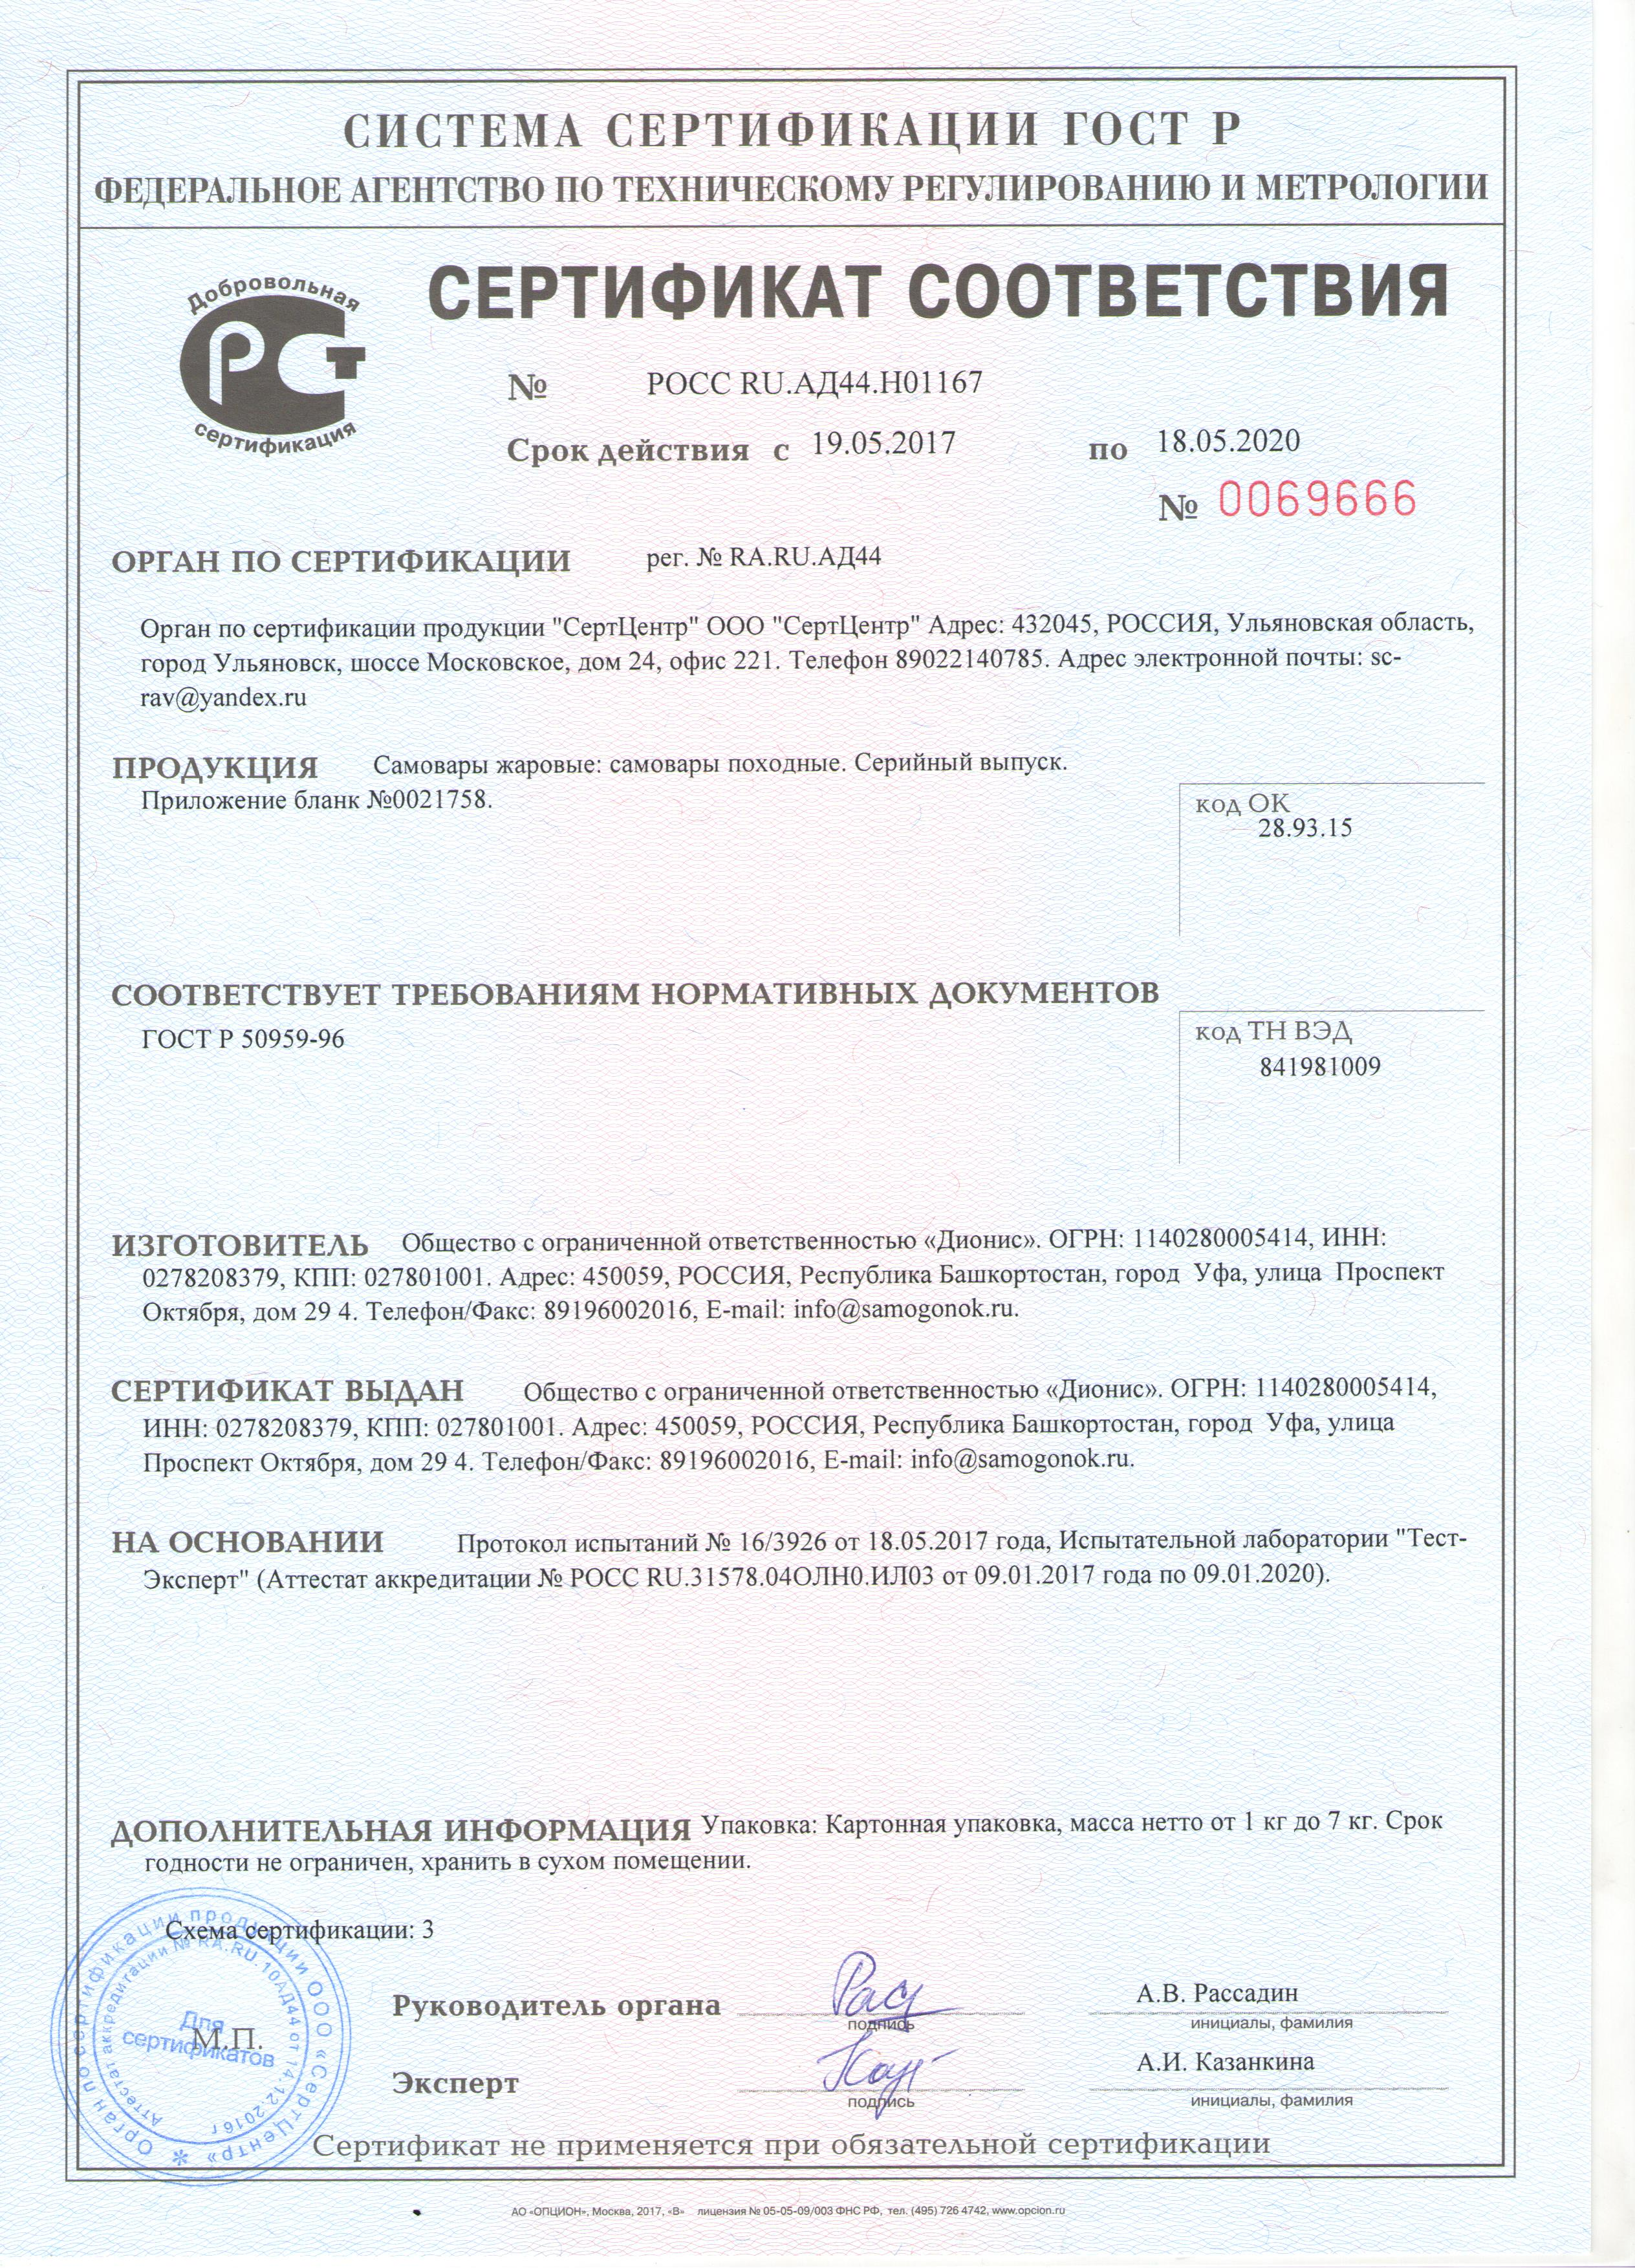 Сертификат соответствия на самовар АЛКОВАР ТУРИСТ